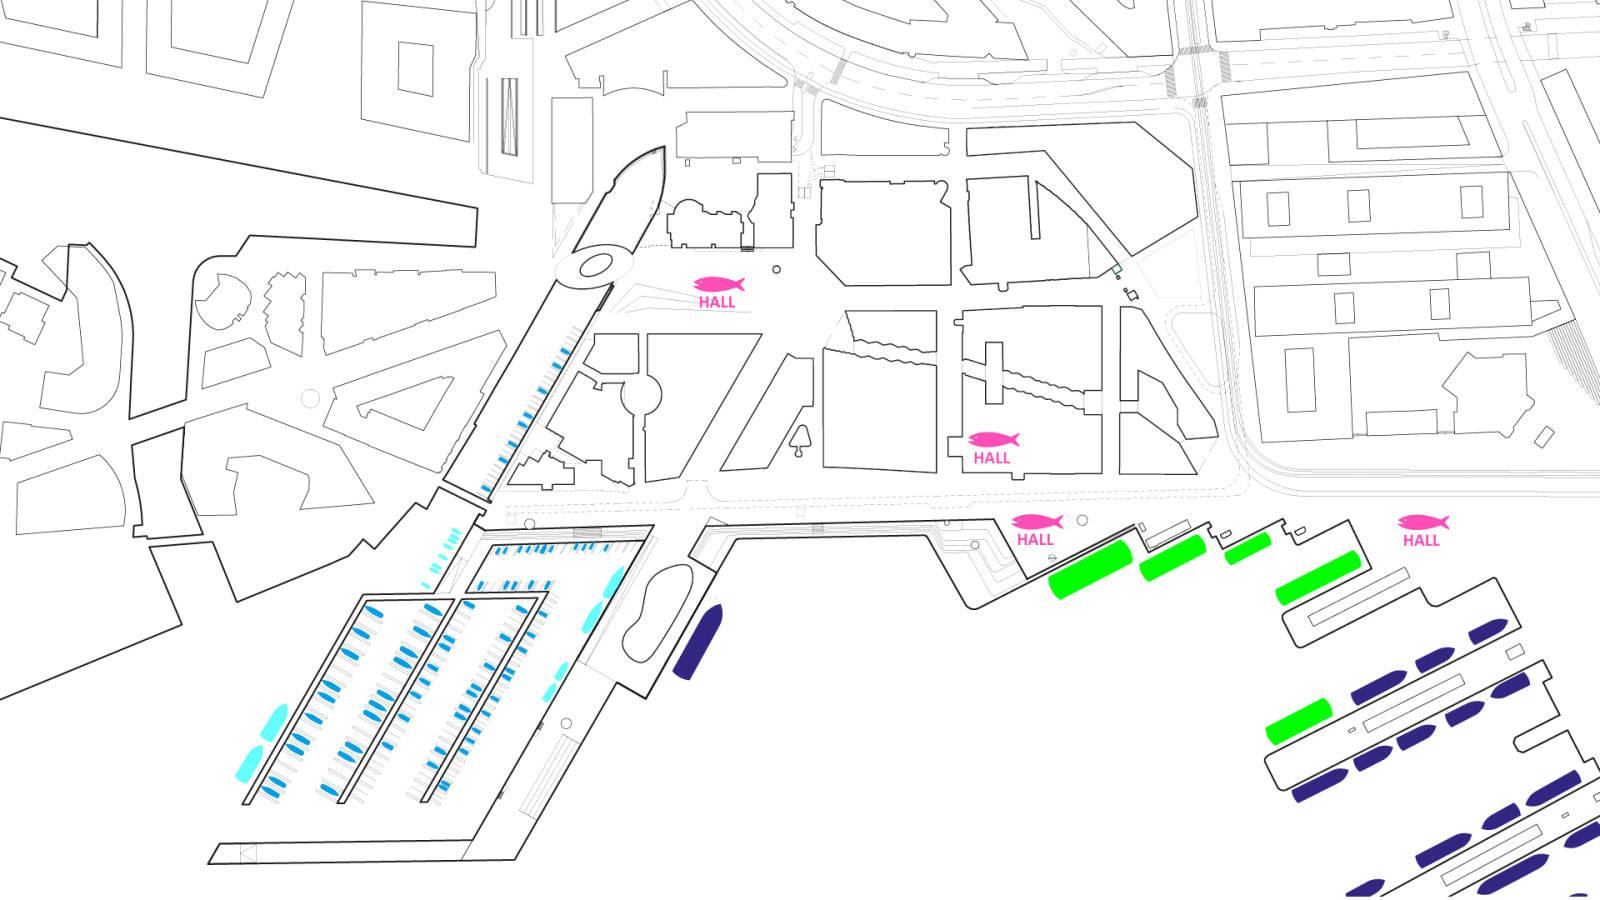 BOATS AND FISHING - Aker Brygge Masterplan - SPOL Architects